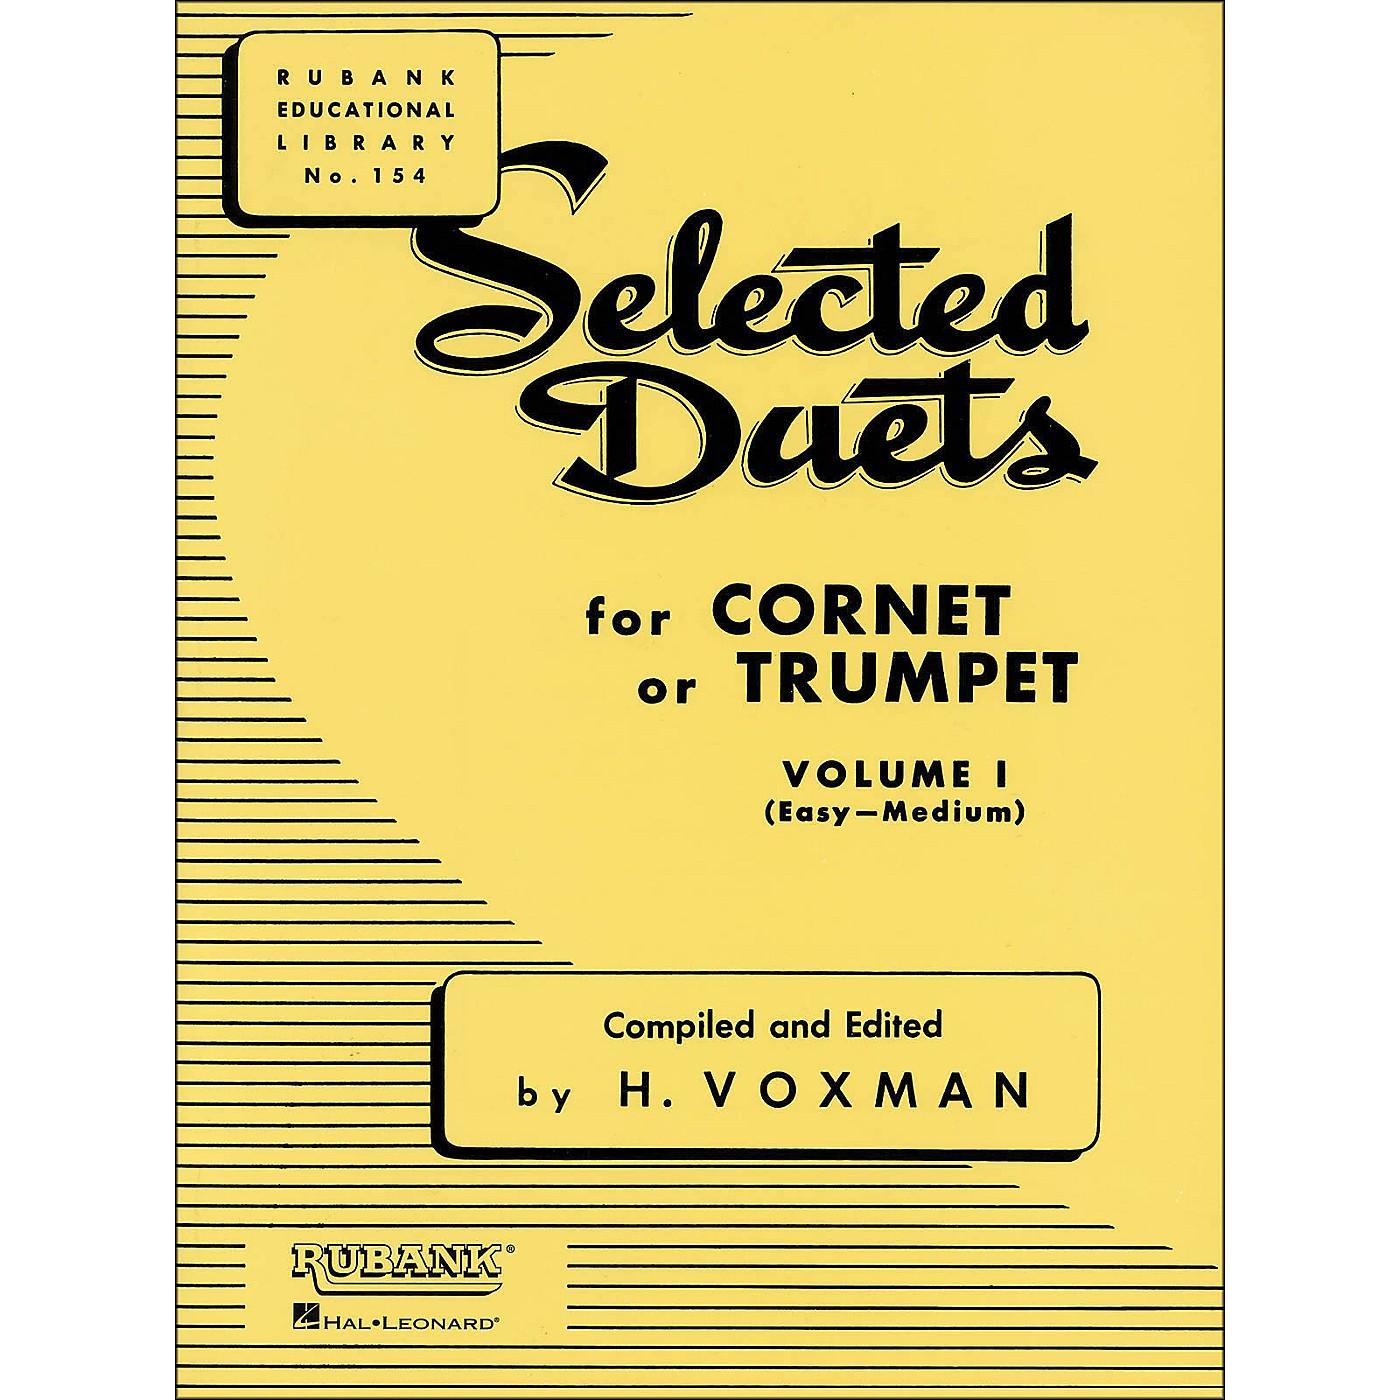 Hal Leonard Rubank Selected Duets for Cornet Or Trumpet Vol 1 Easy/Medium thumbnail